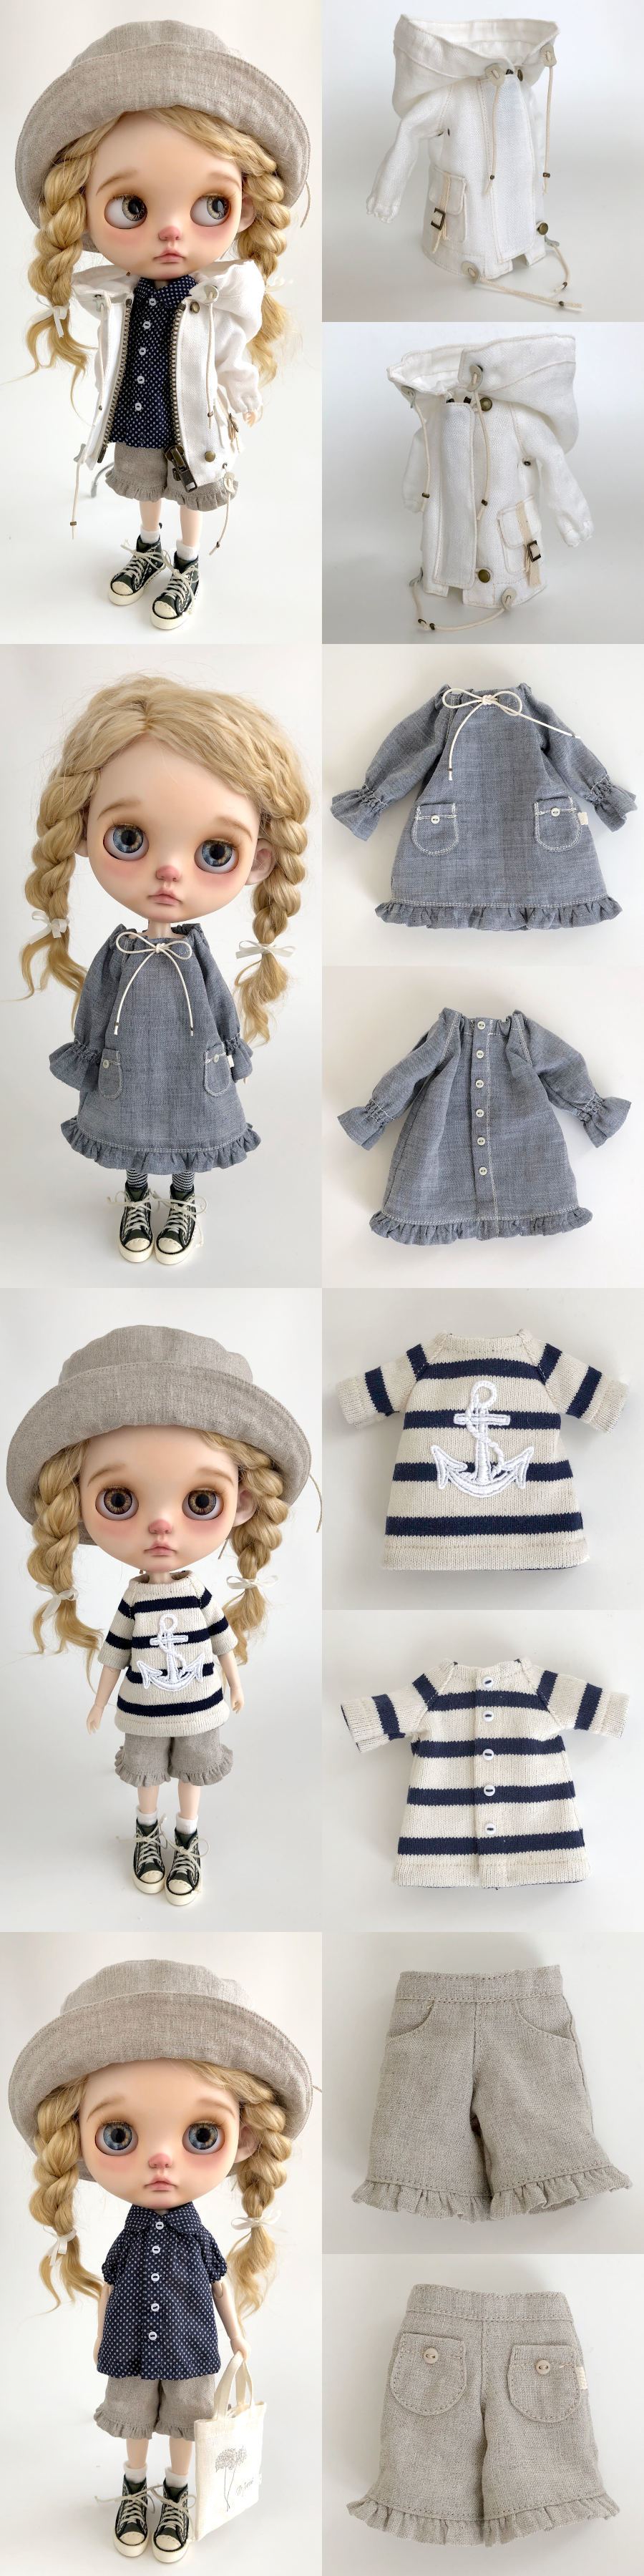 * lucalily * dolls clothes * White blouson set *_d0217189_11123259.jpg